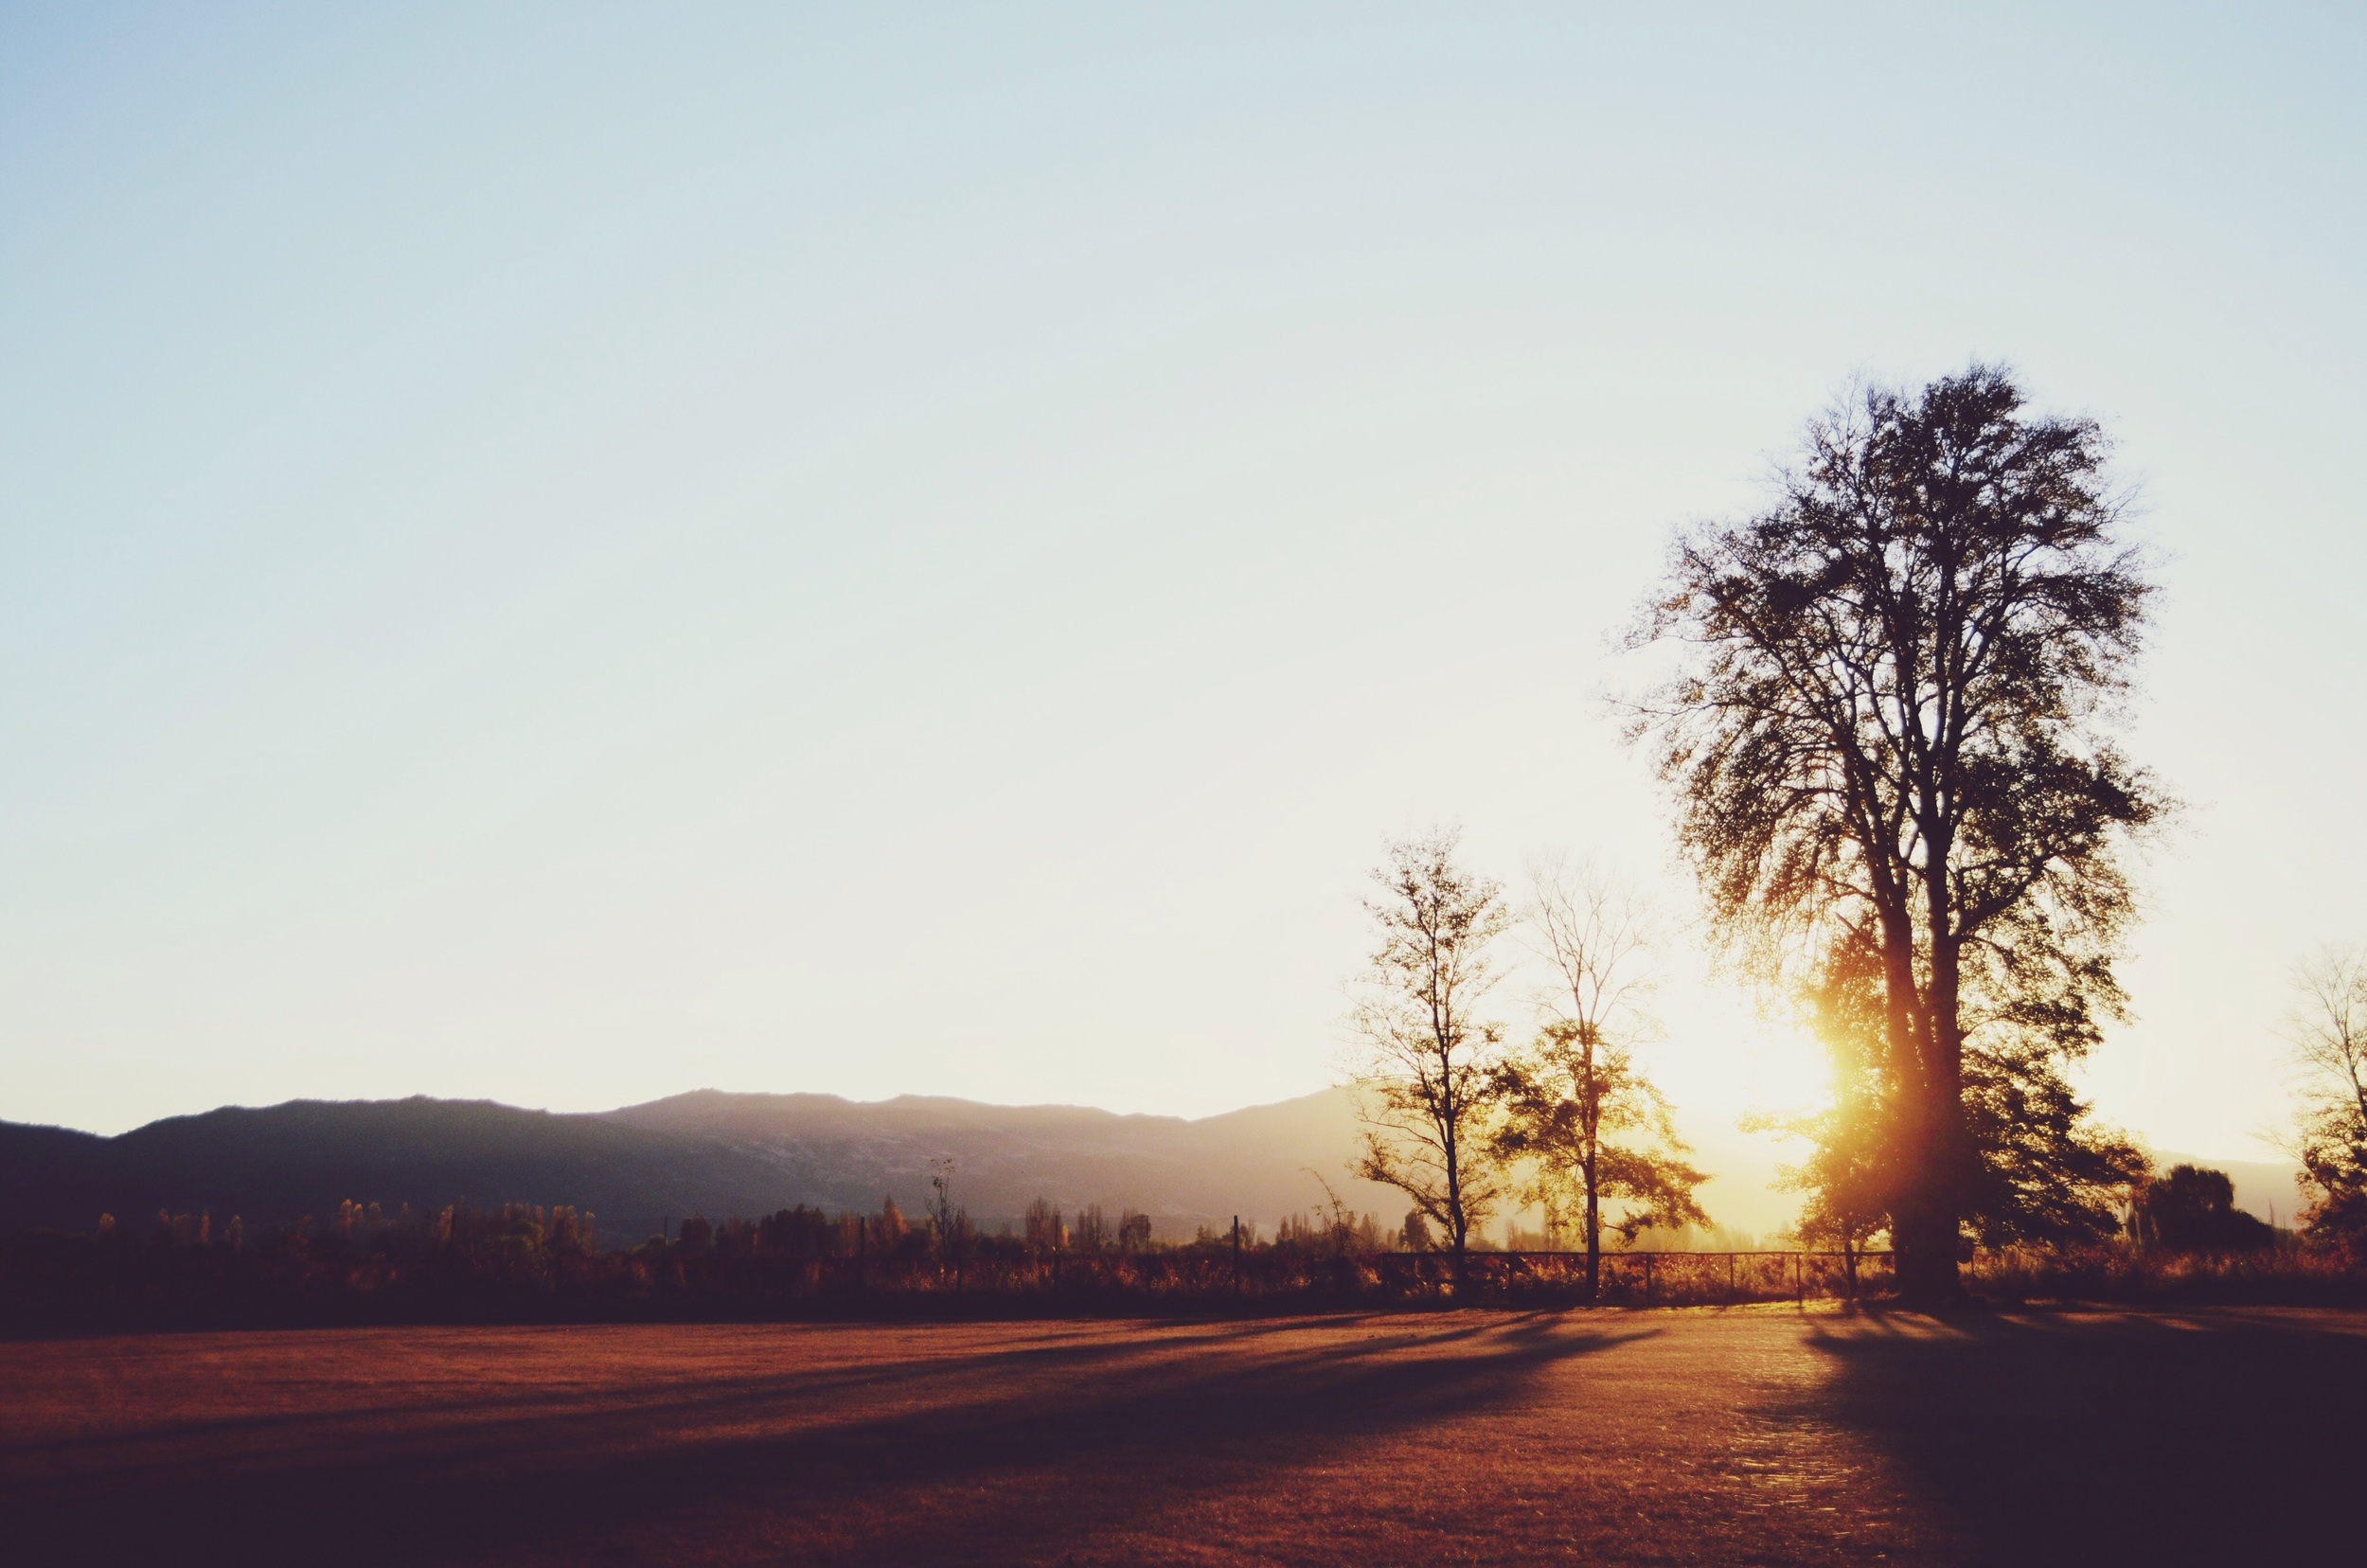 Sunset outside the vineyard // 29 may